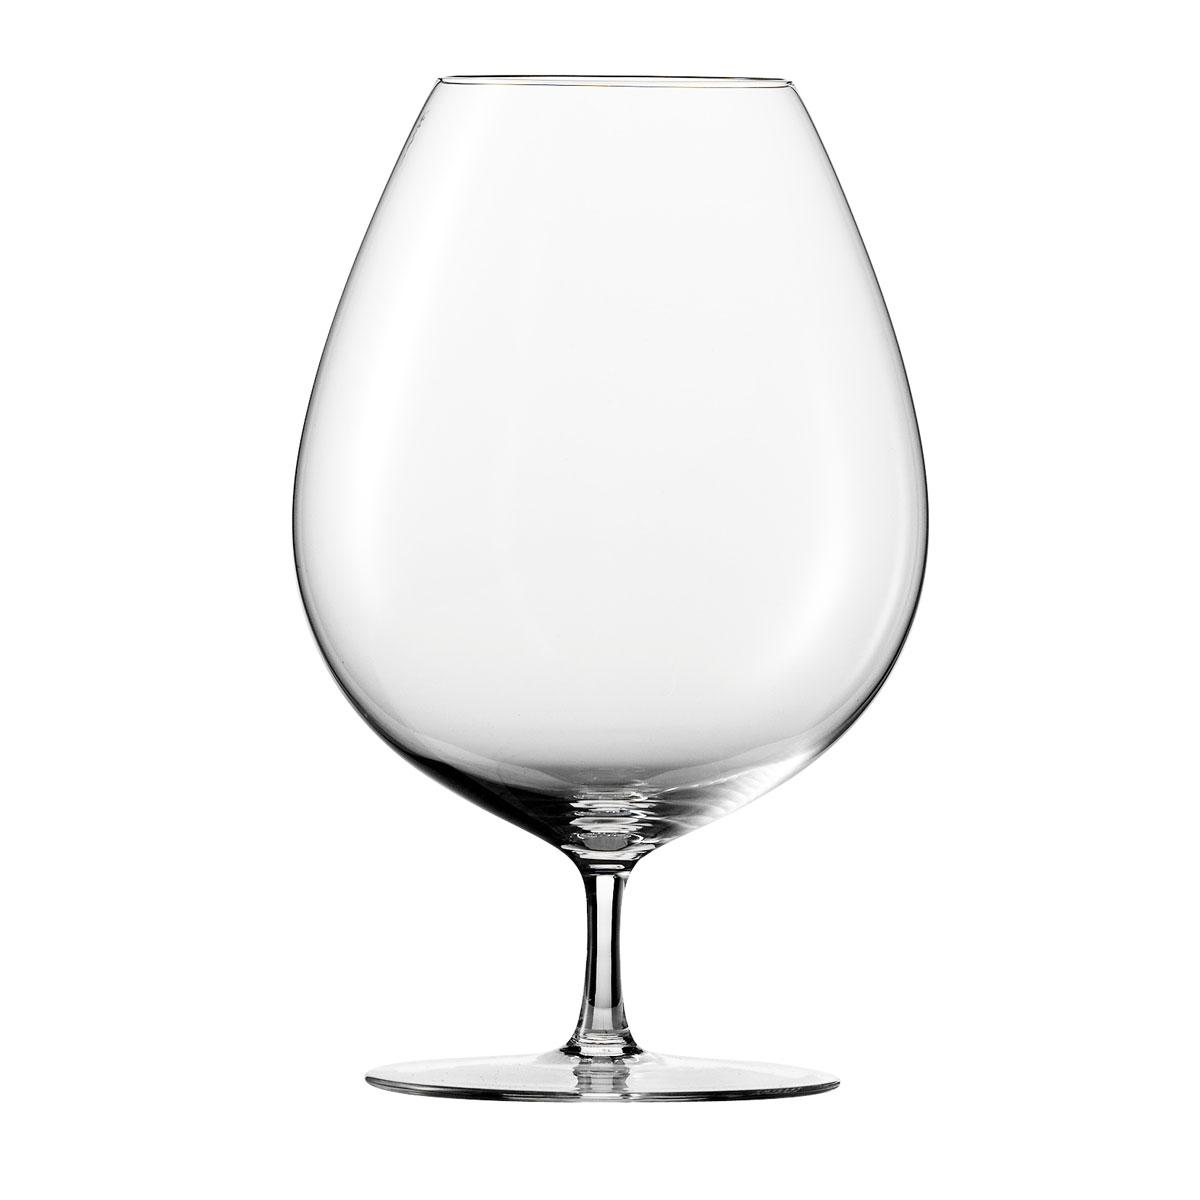 Schott Zwiesel Tritan Crystal, 1872 Enoteca Cognac XL Magnum, Single